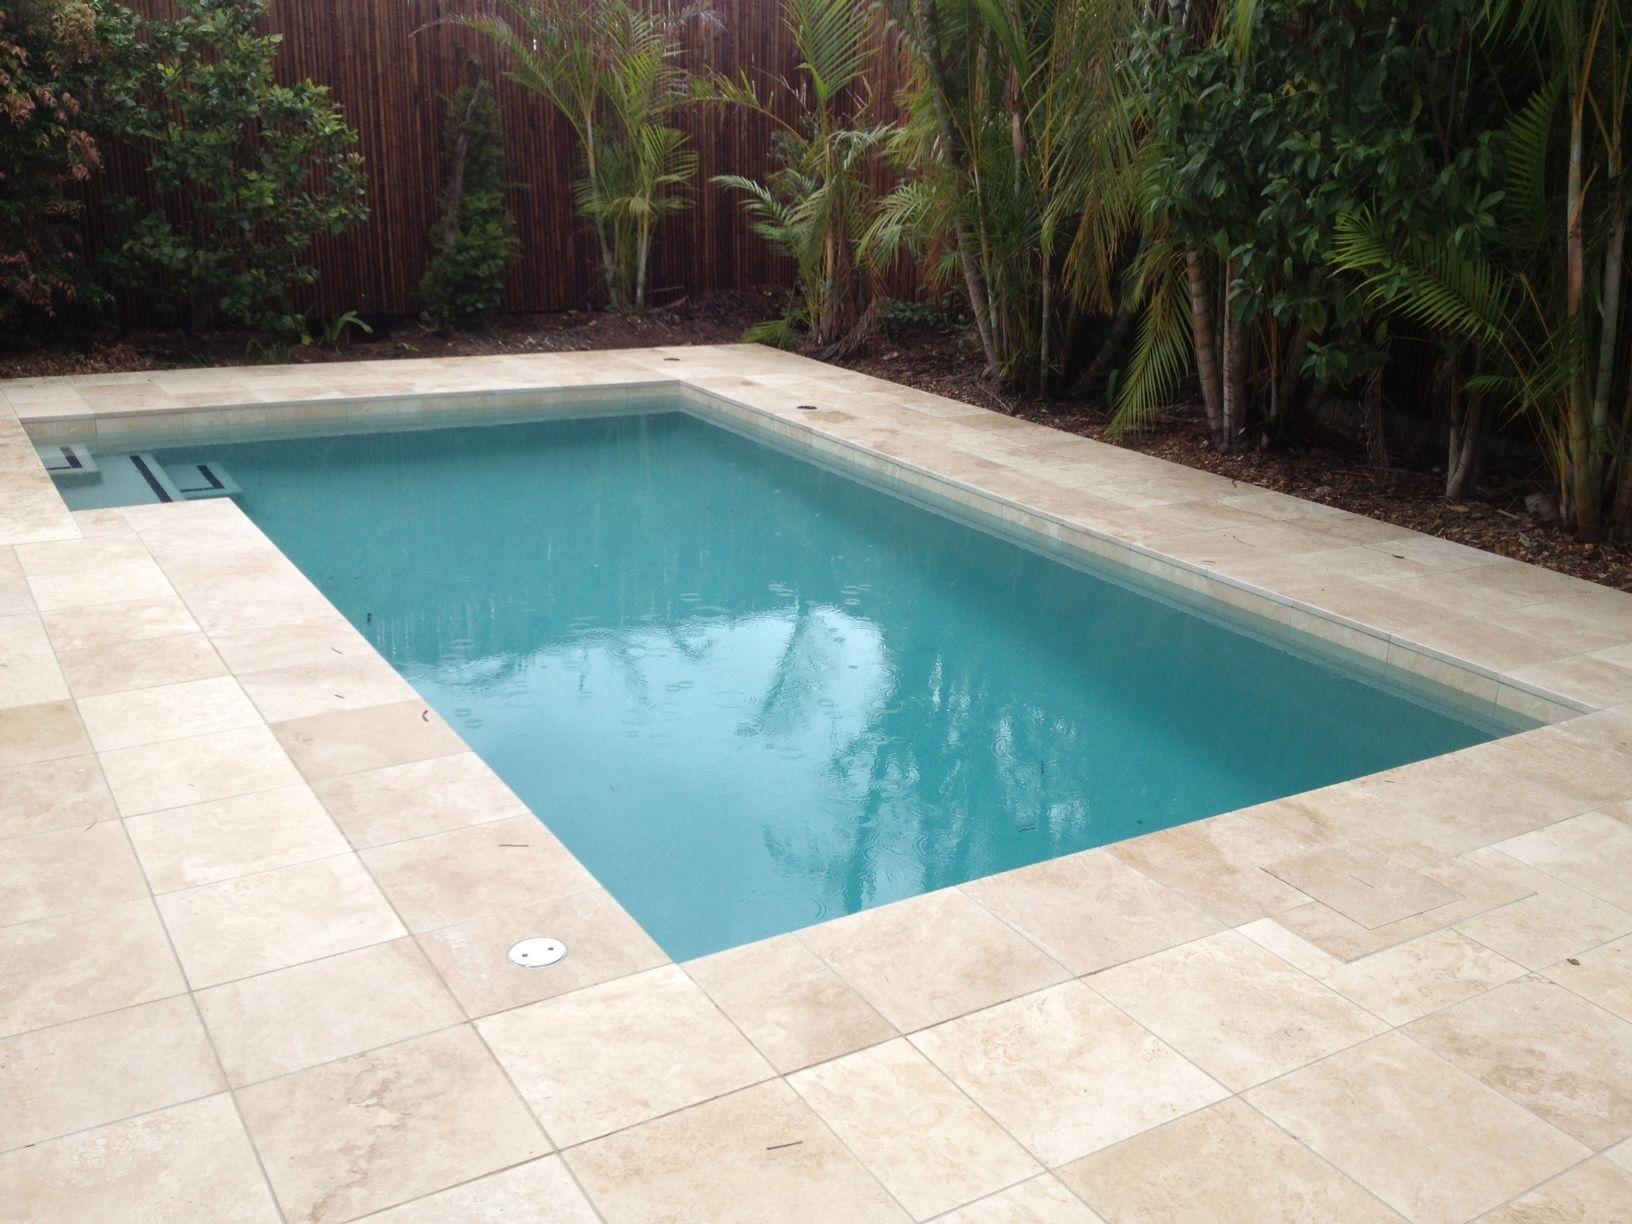 Lovely Pool Garden Ideas With Travertine Pool Floors Tiled